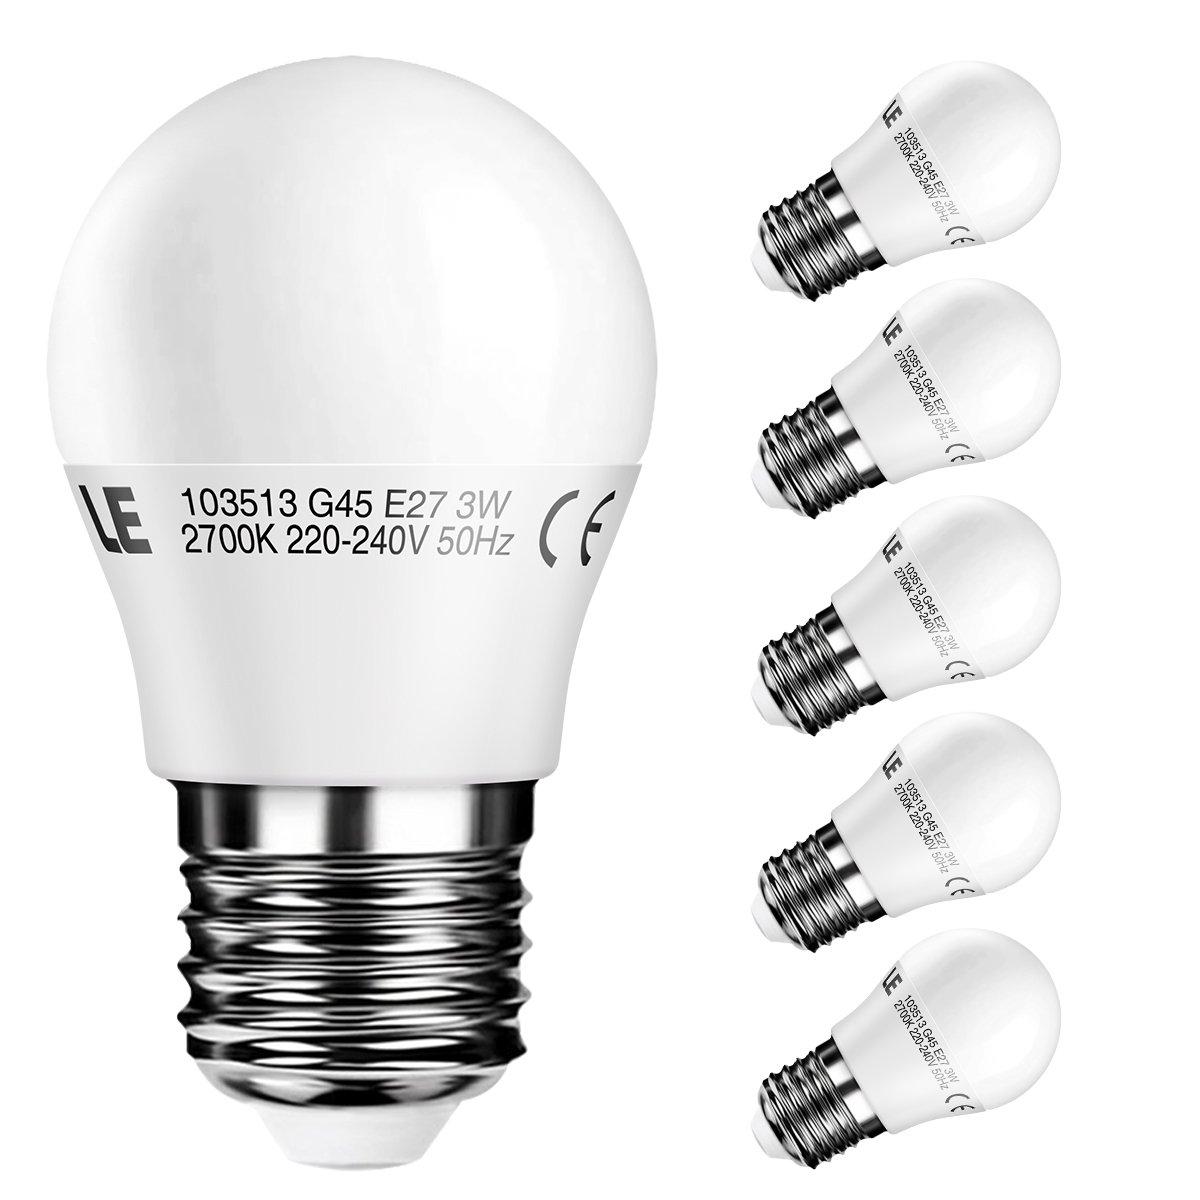 LE 5er E27 led Lampe 2700k warmweiß 3W entspricht 25W Glühlampe led ...